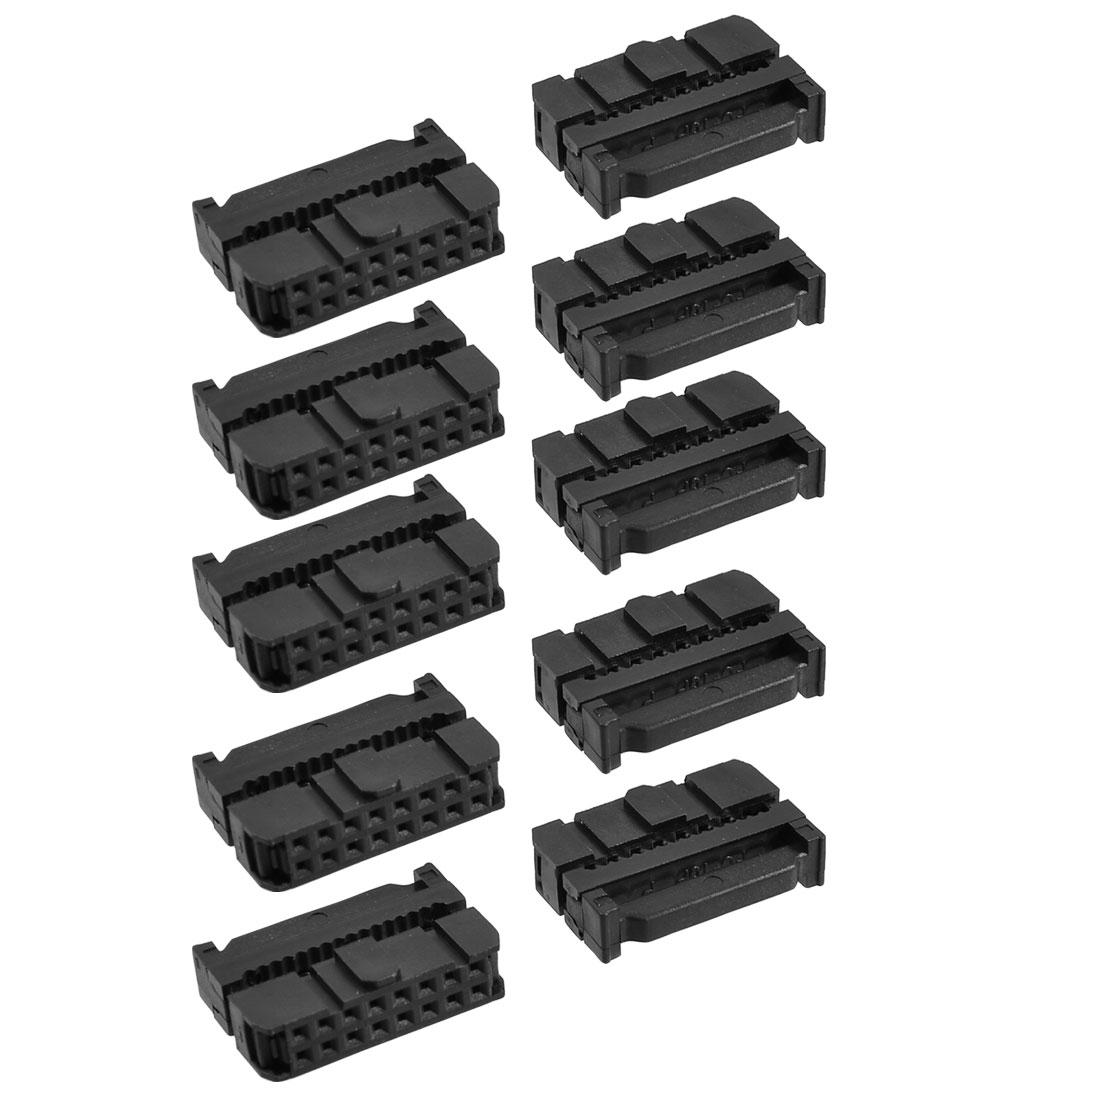 Unique Bargains 10 x 2.54mm Pitch Female 16 Pins Flat Cable IDC Socket Connector Black